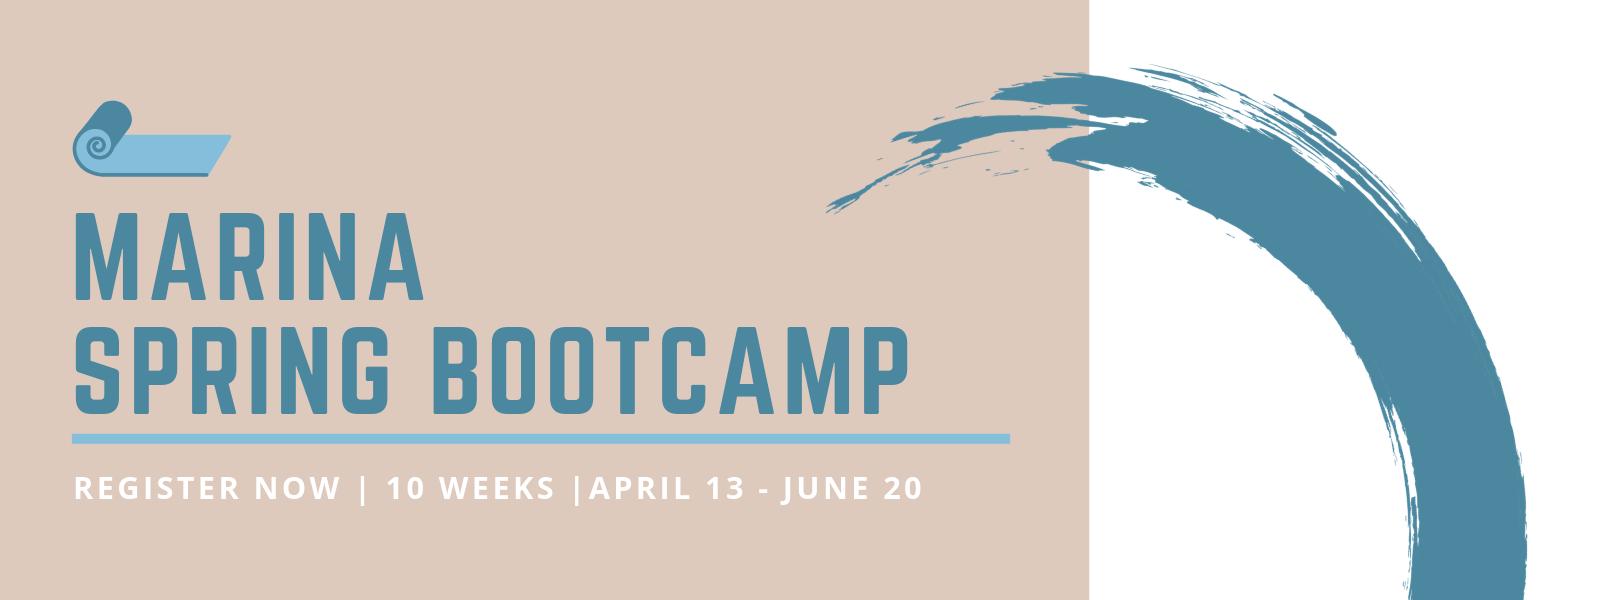 Spring Bootcamp